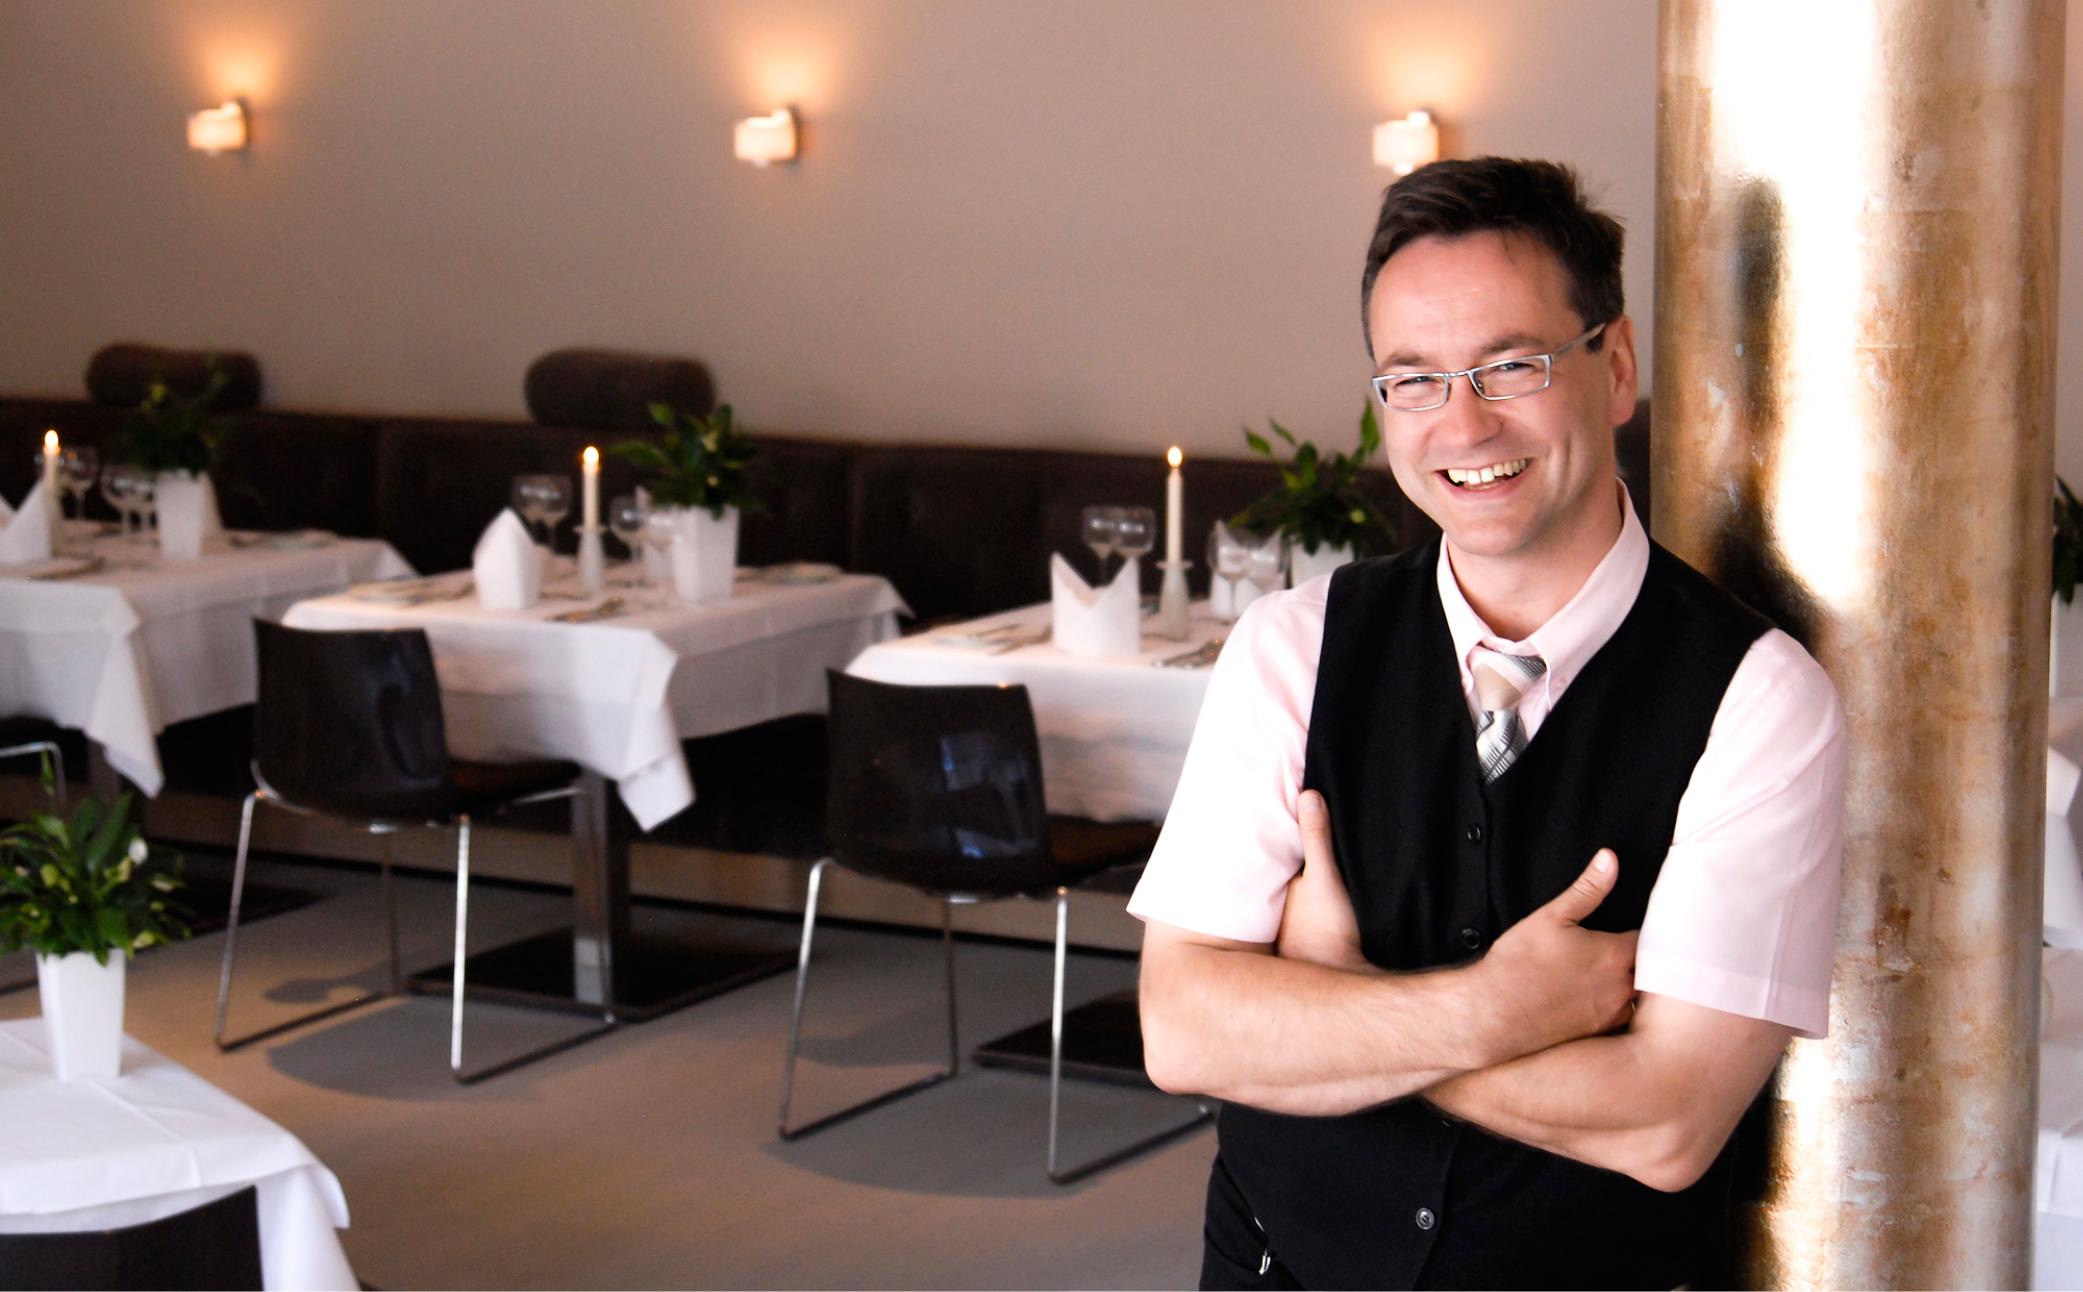 Erfolgreicher Restaurantbesitzer - Business Portraits - Business Branding Fotografie Berlin